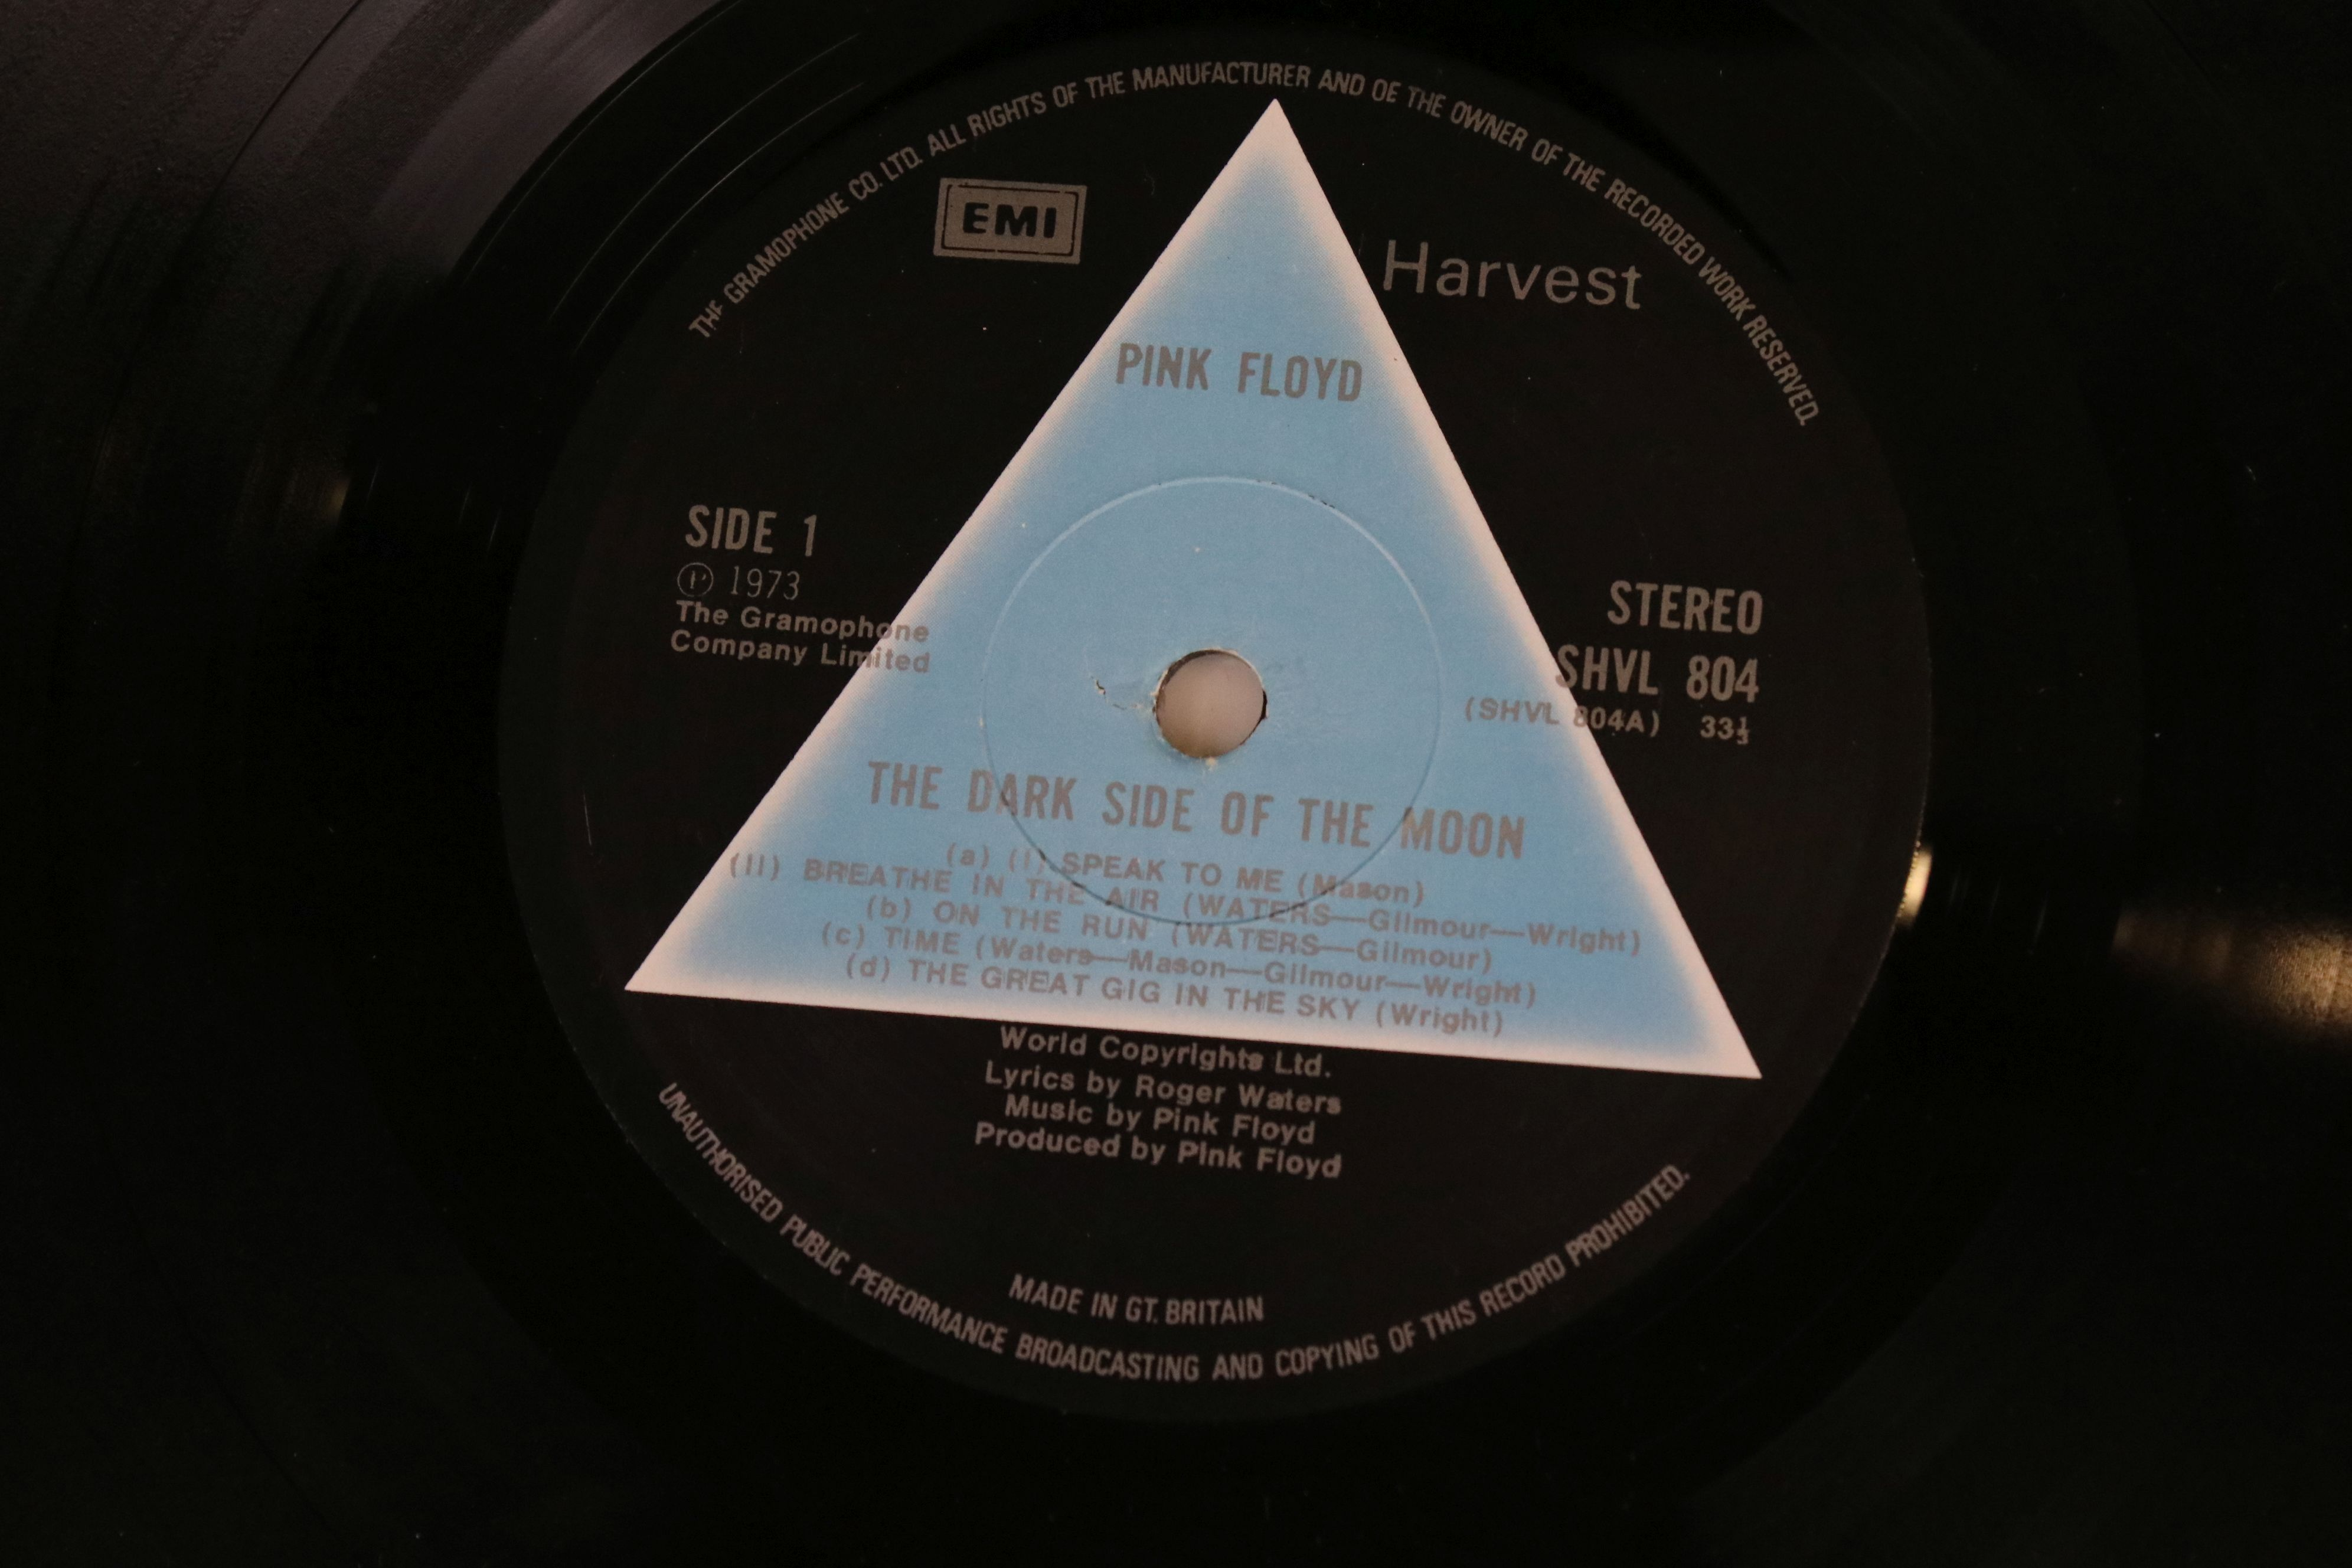 Vinyl - Pink Floyd Dark Side of The Moon LP on Harvest SHVL804 Stereo, solid light blue triangle, no - Image 2 of 6